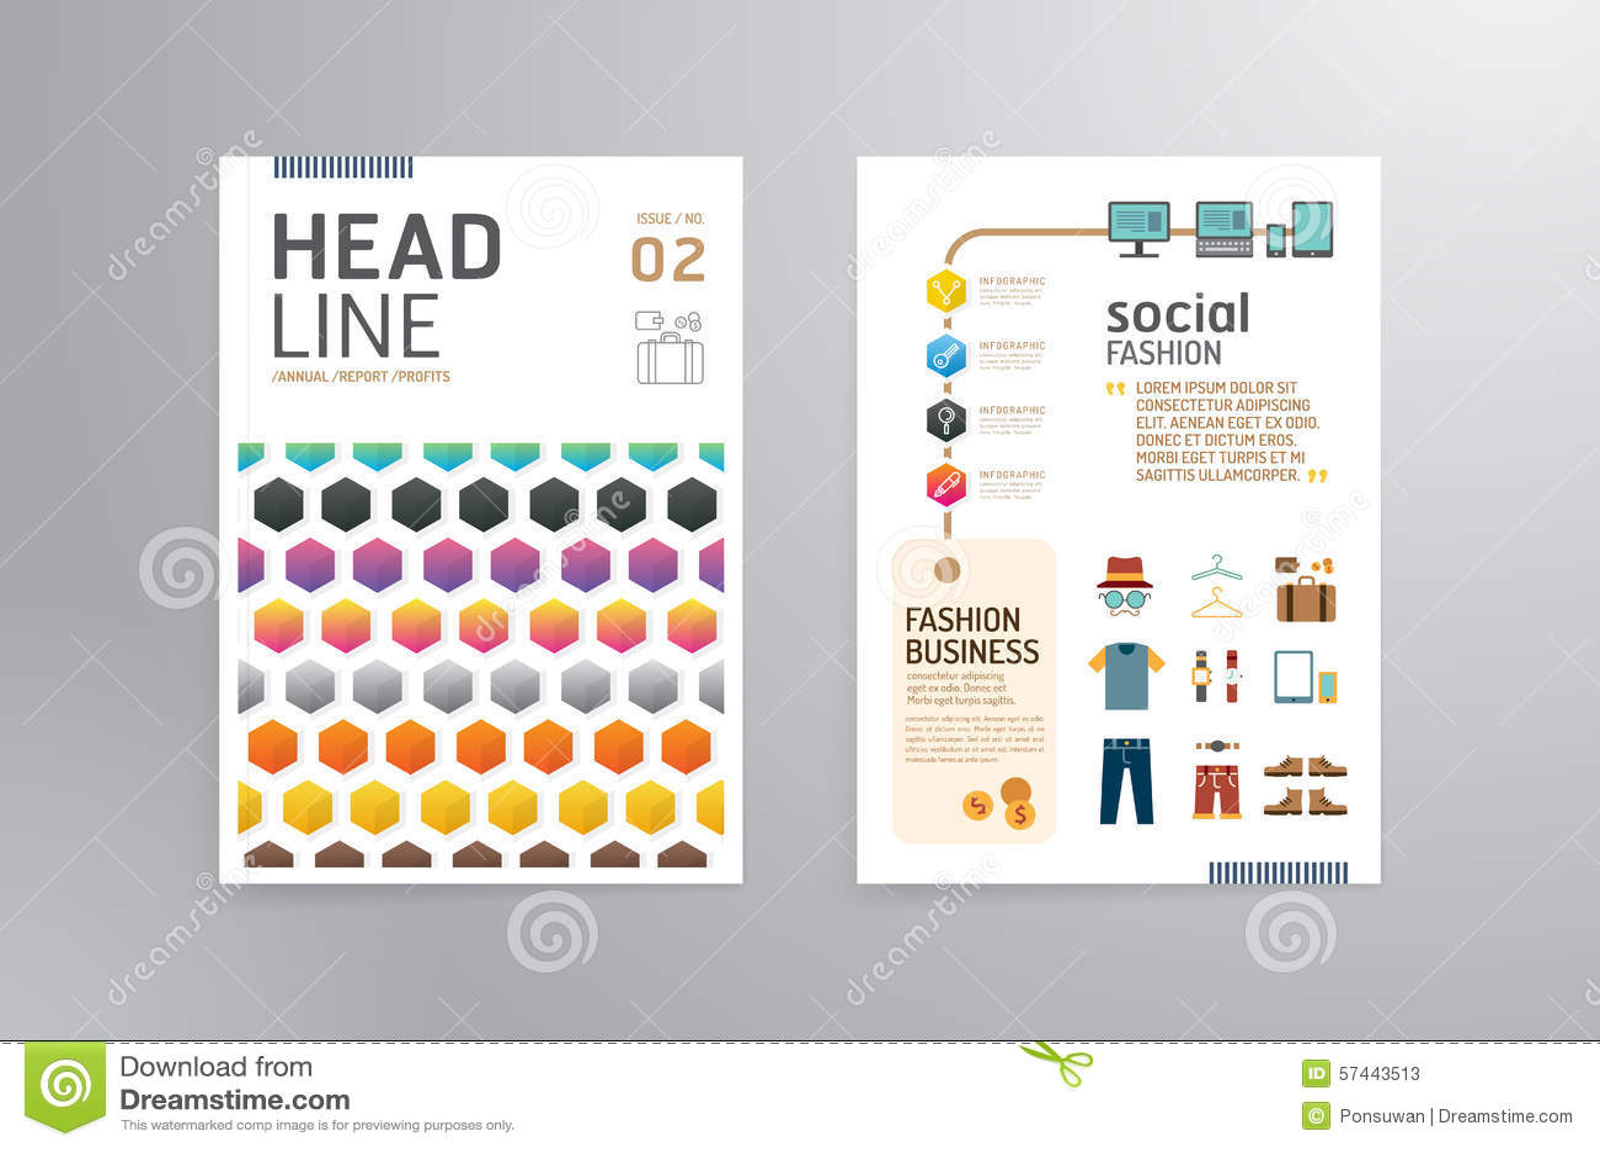 Magazine Cover Design Stock Illustrations 277 532 Magazine Cover Design Stock Illustrations Vectors Clipart Dreamstime